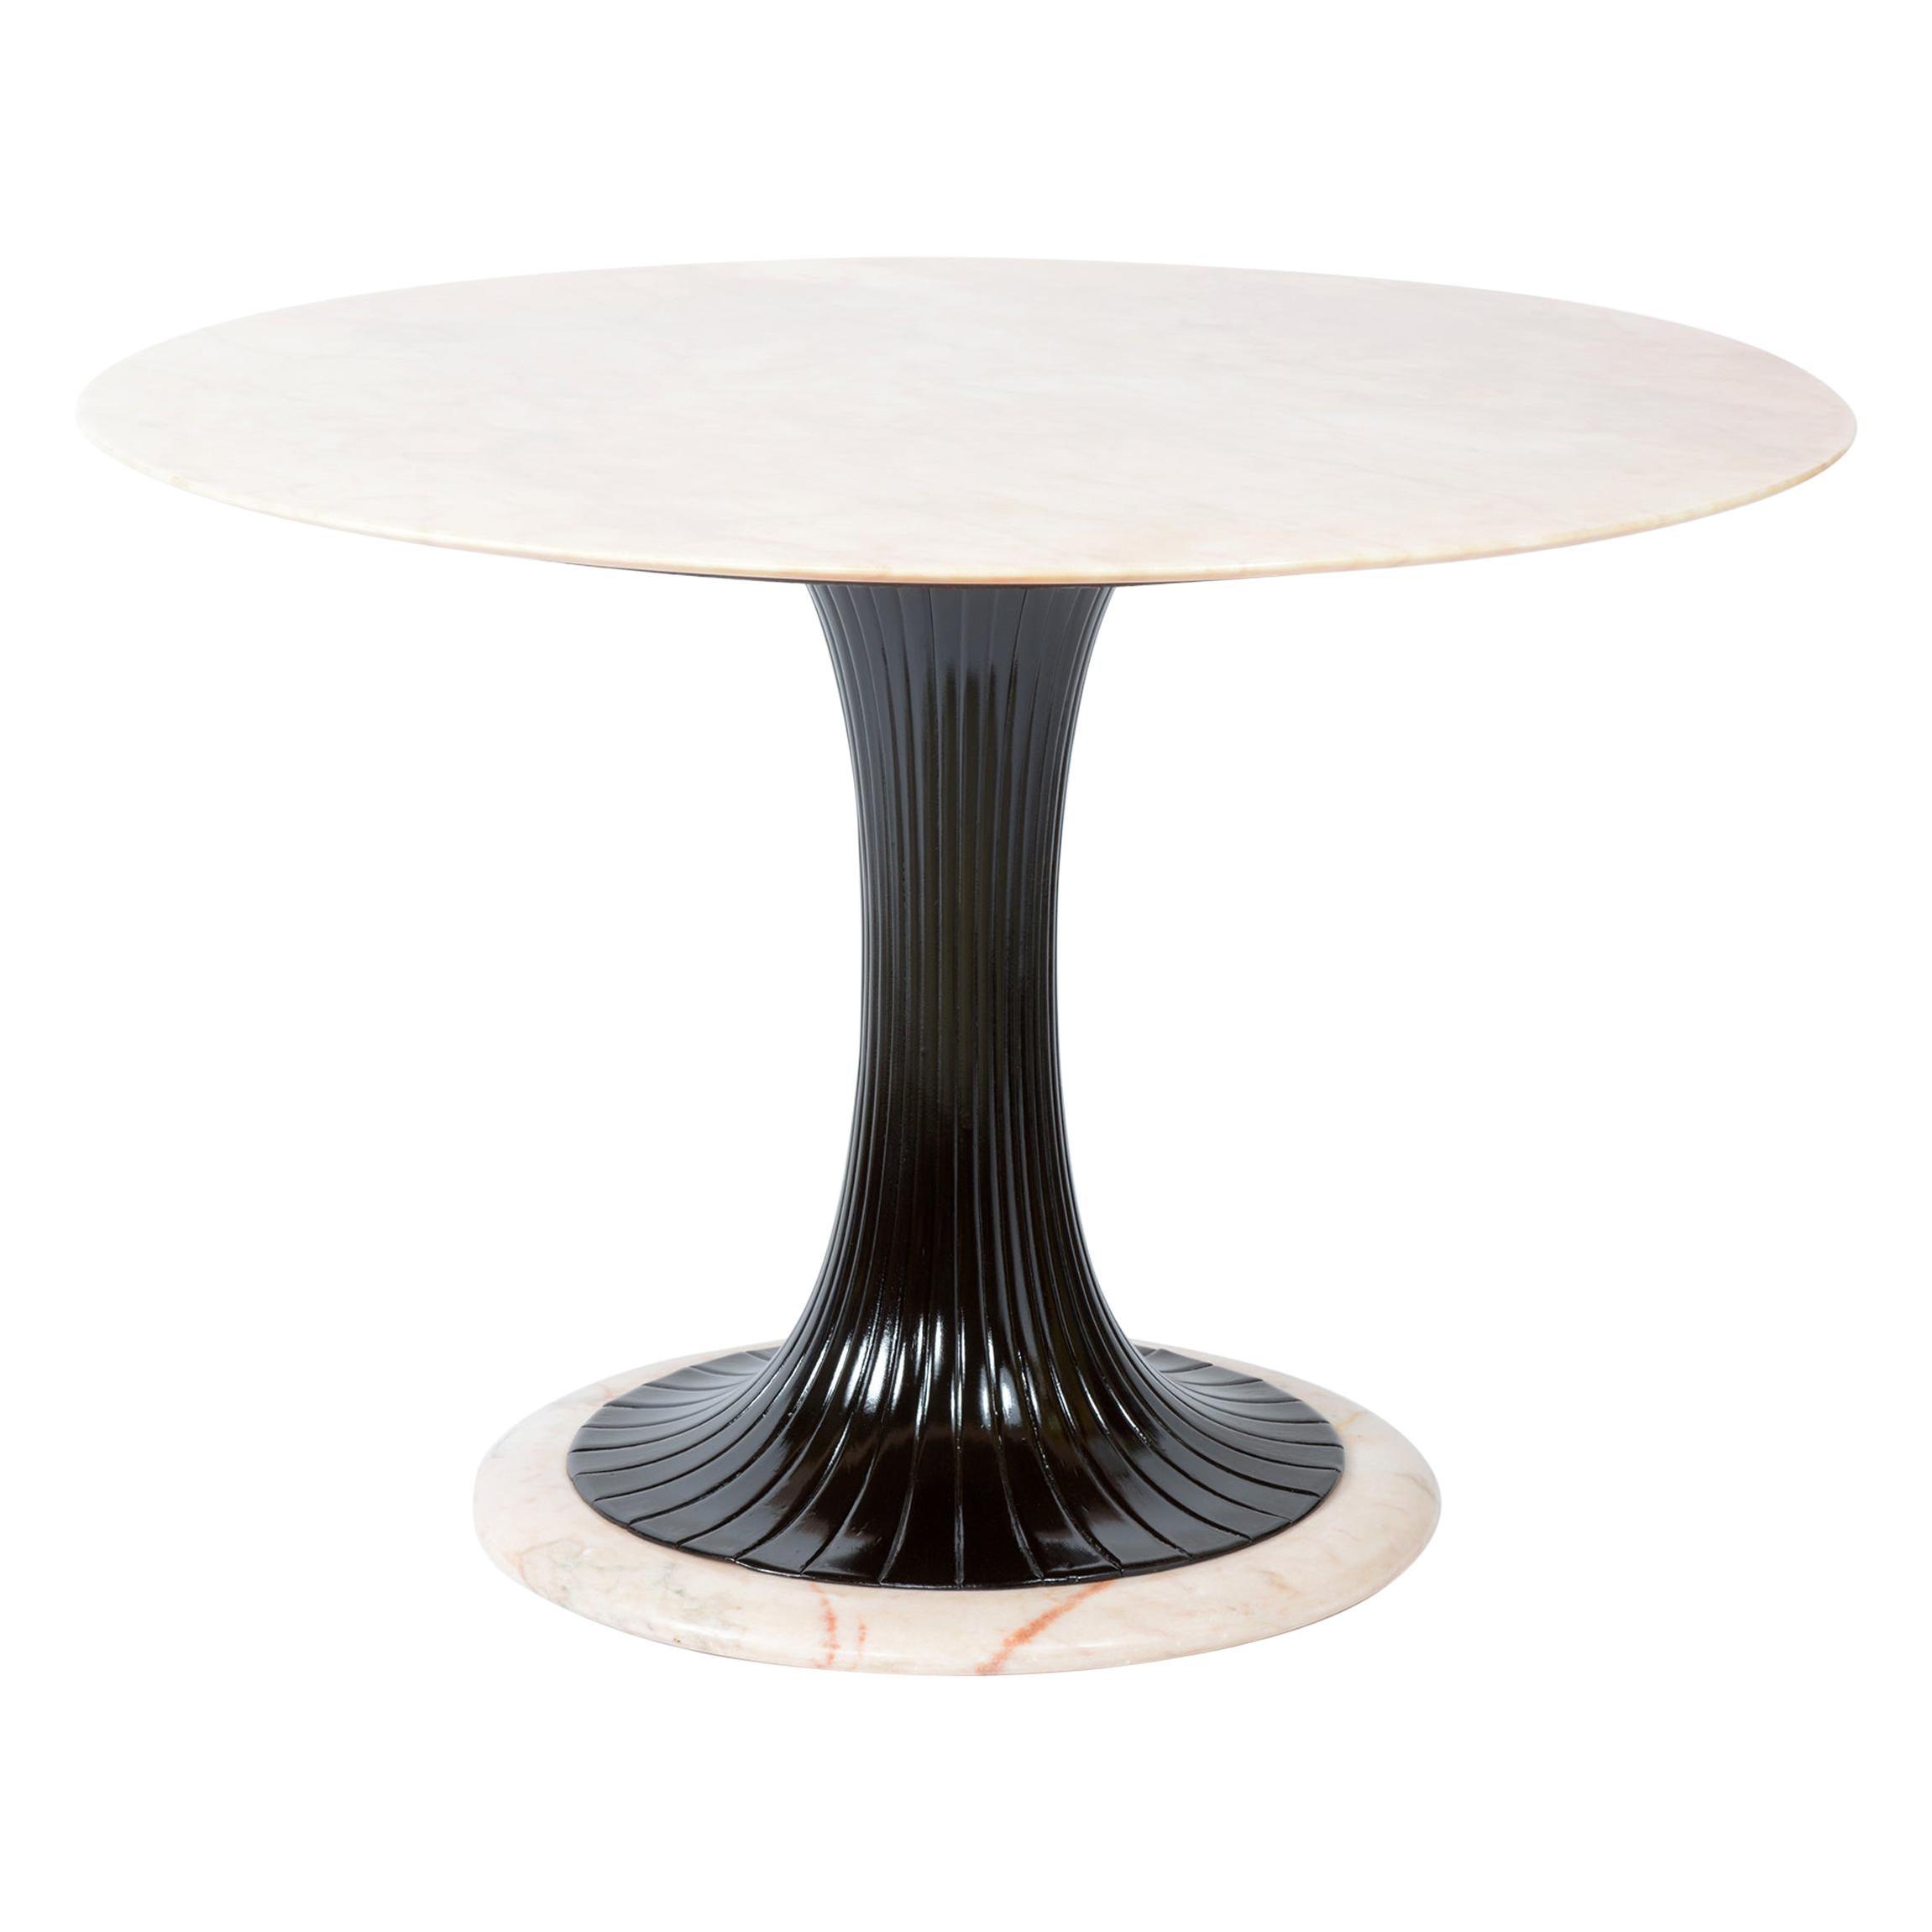 Dassi Lissone Milano Italy Midcentury Round Marble Top Table